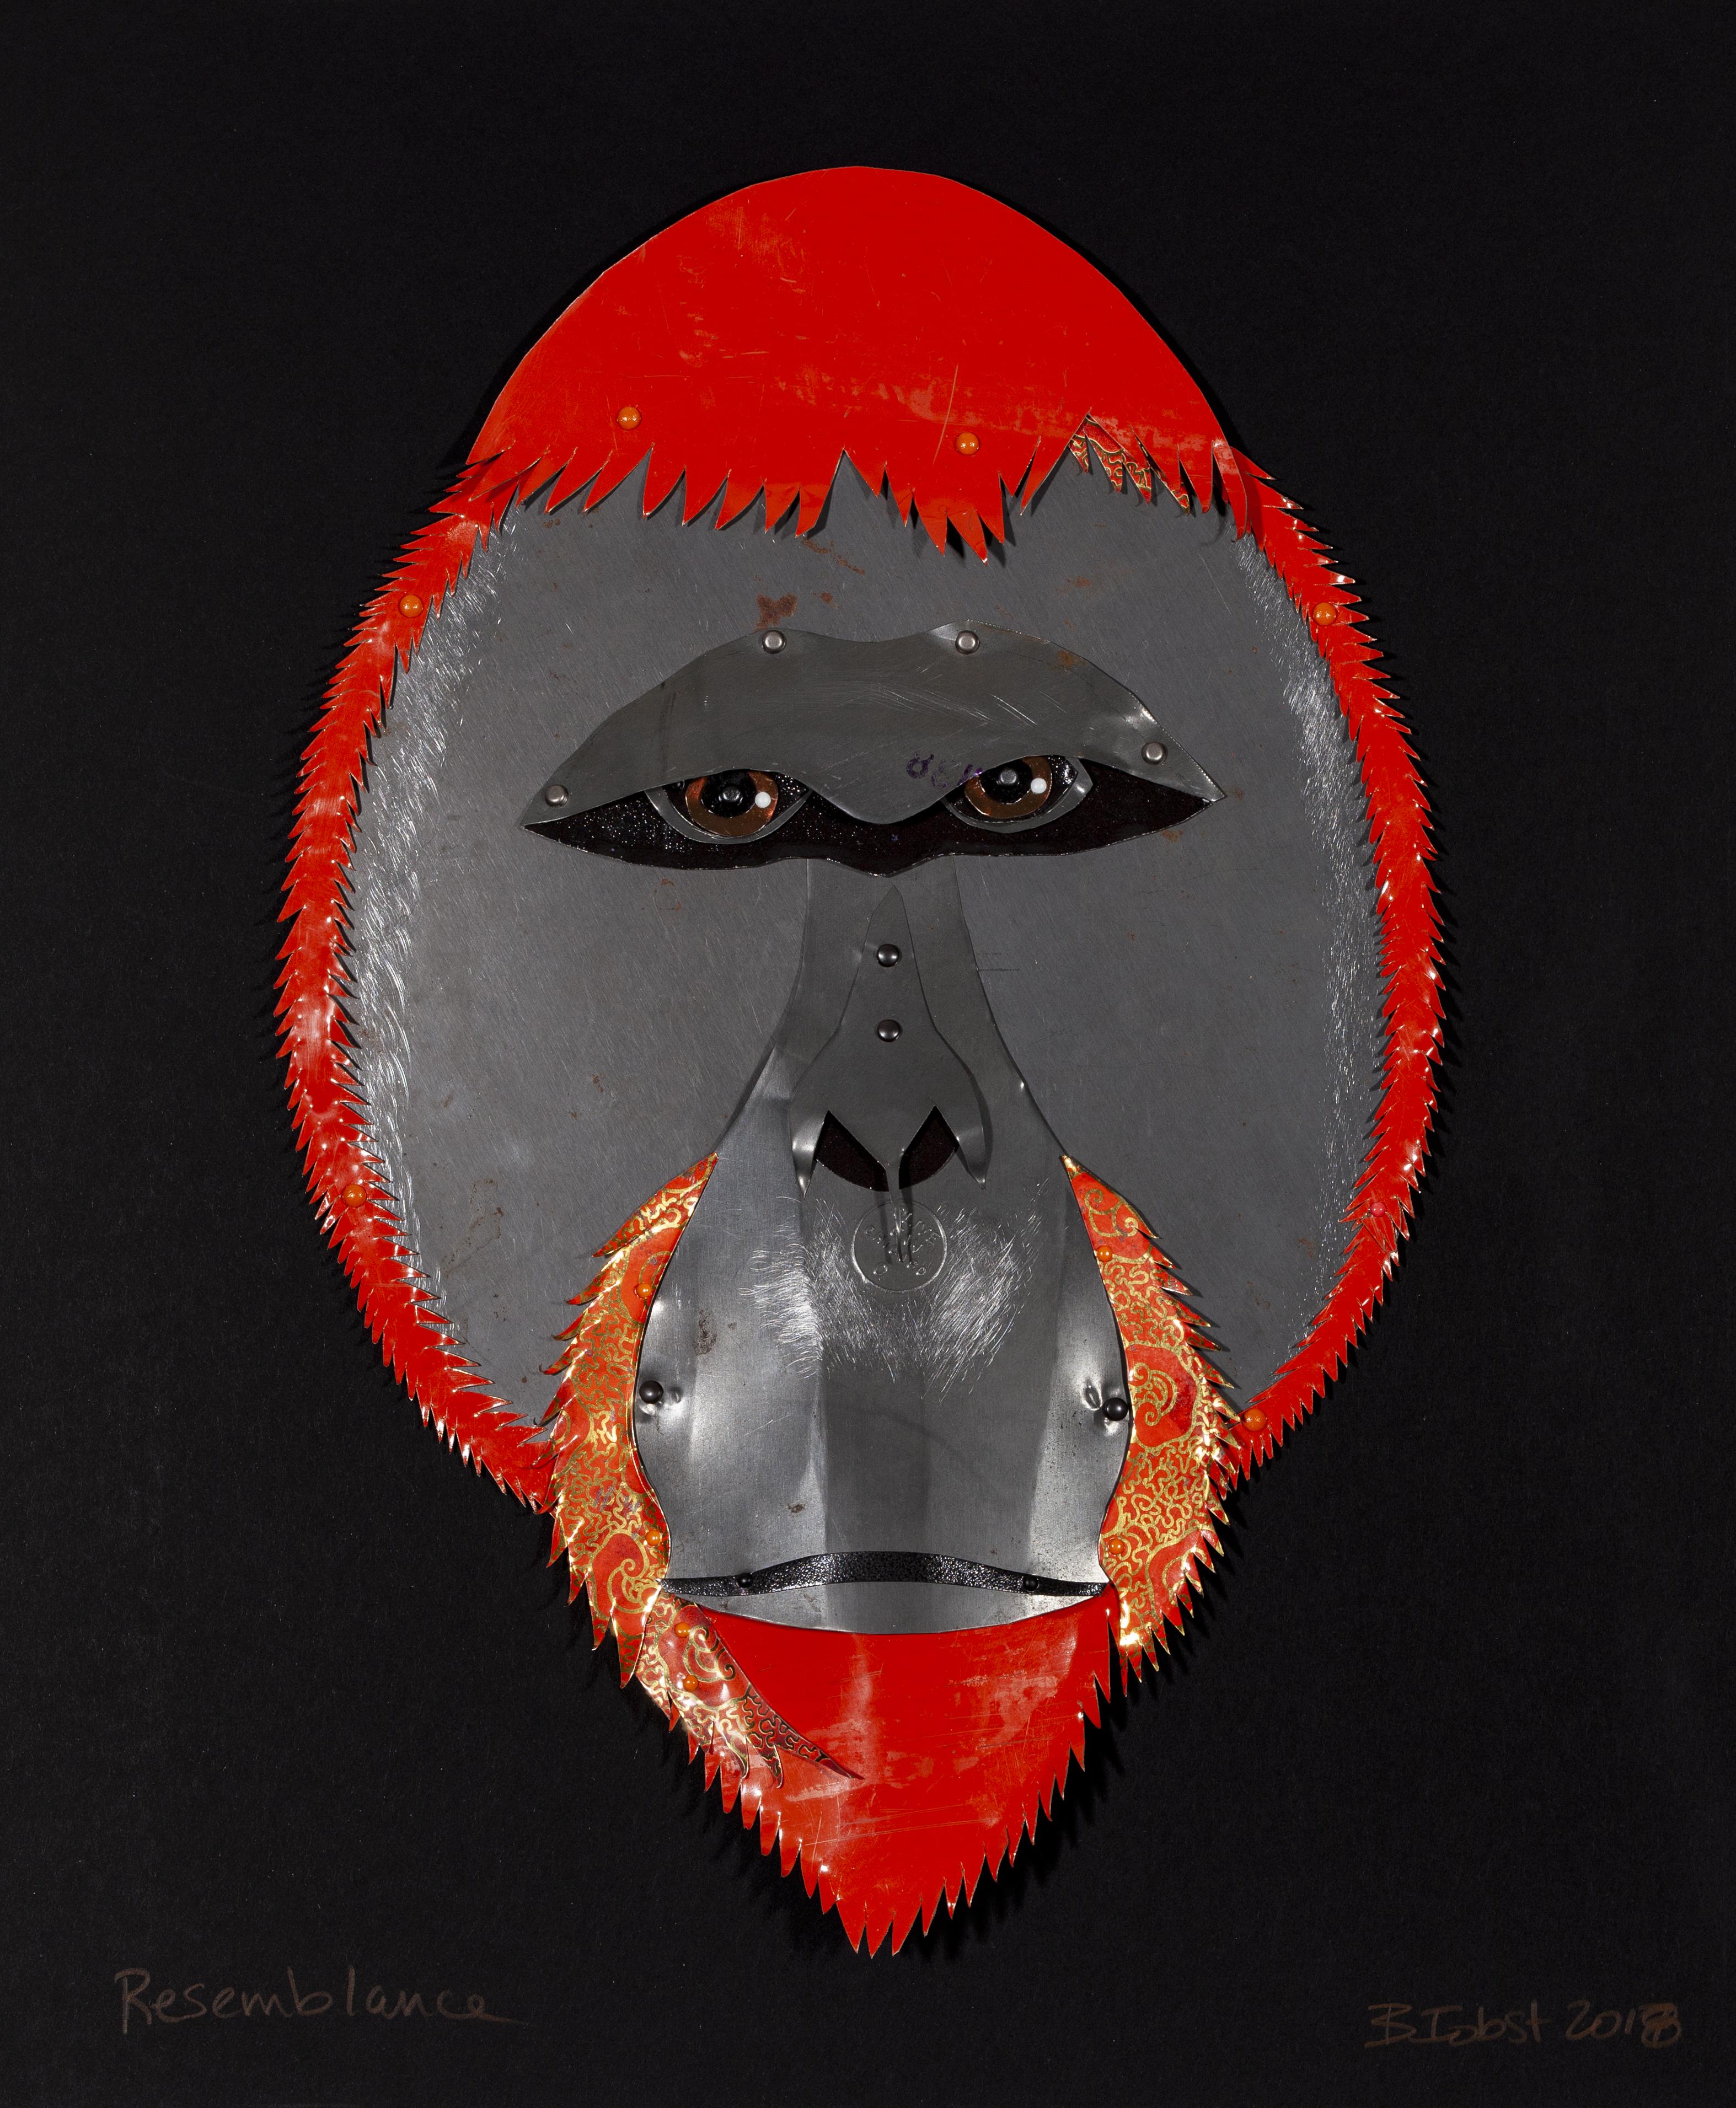 Resemblance - Borneon Orangutan